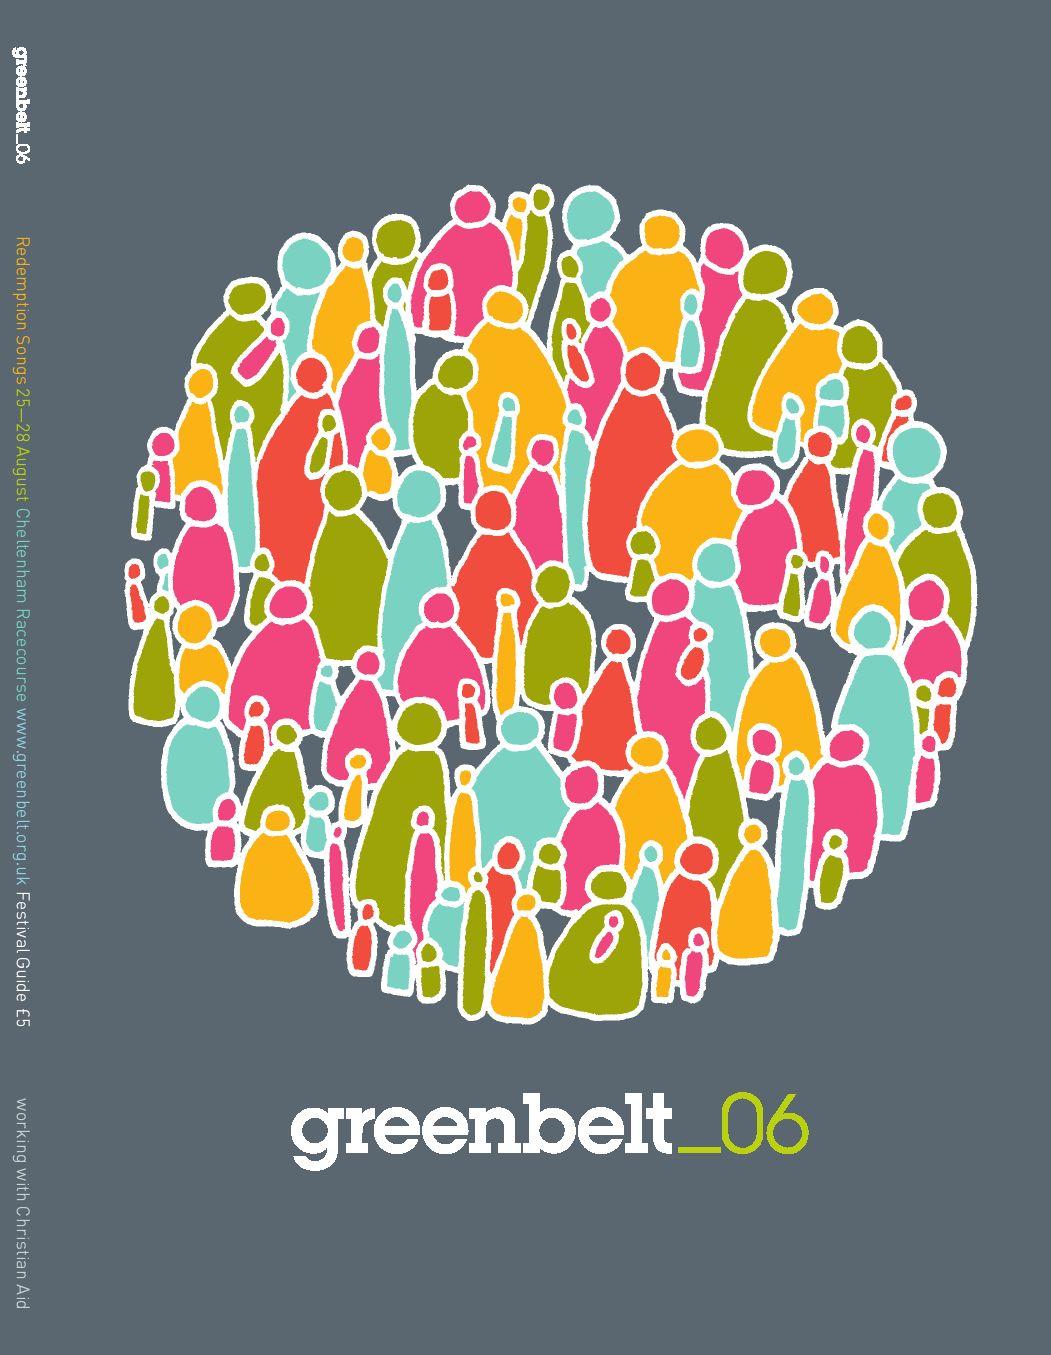 Greenbelt festival guide 2006 by greenbeltfestival issuu biocorpaavc